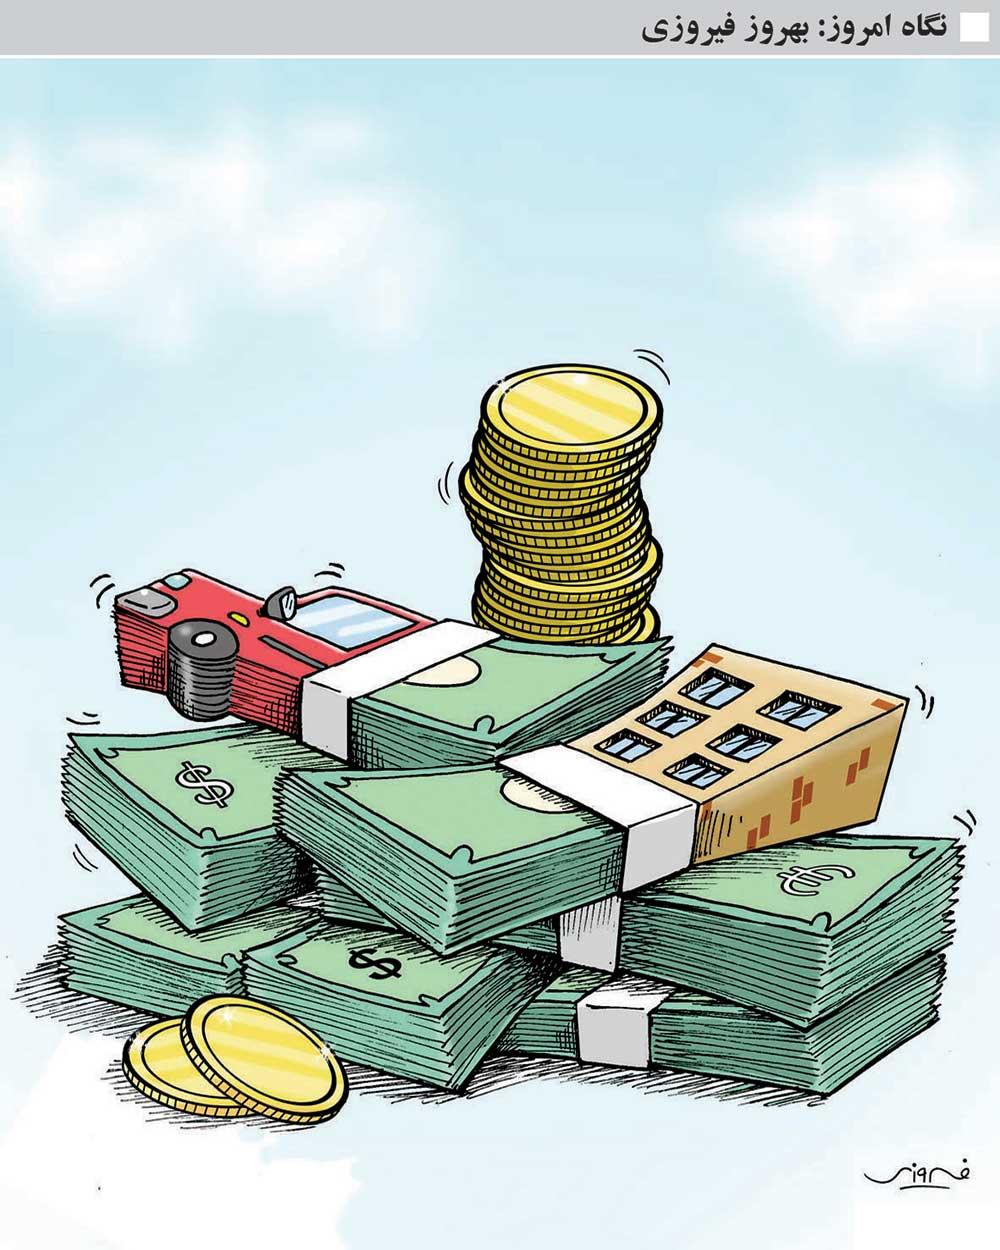 کارتون/ احوالات اوضاع اقتصادی این روزها